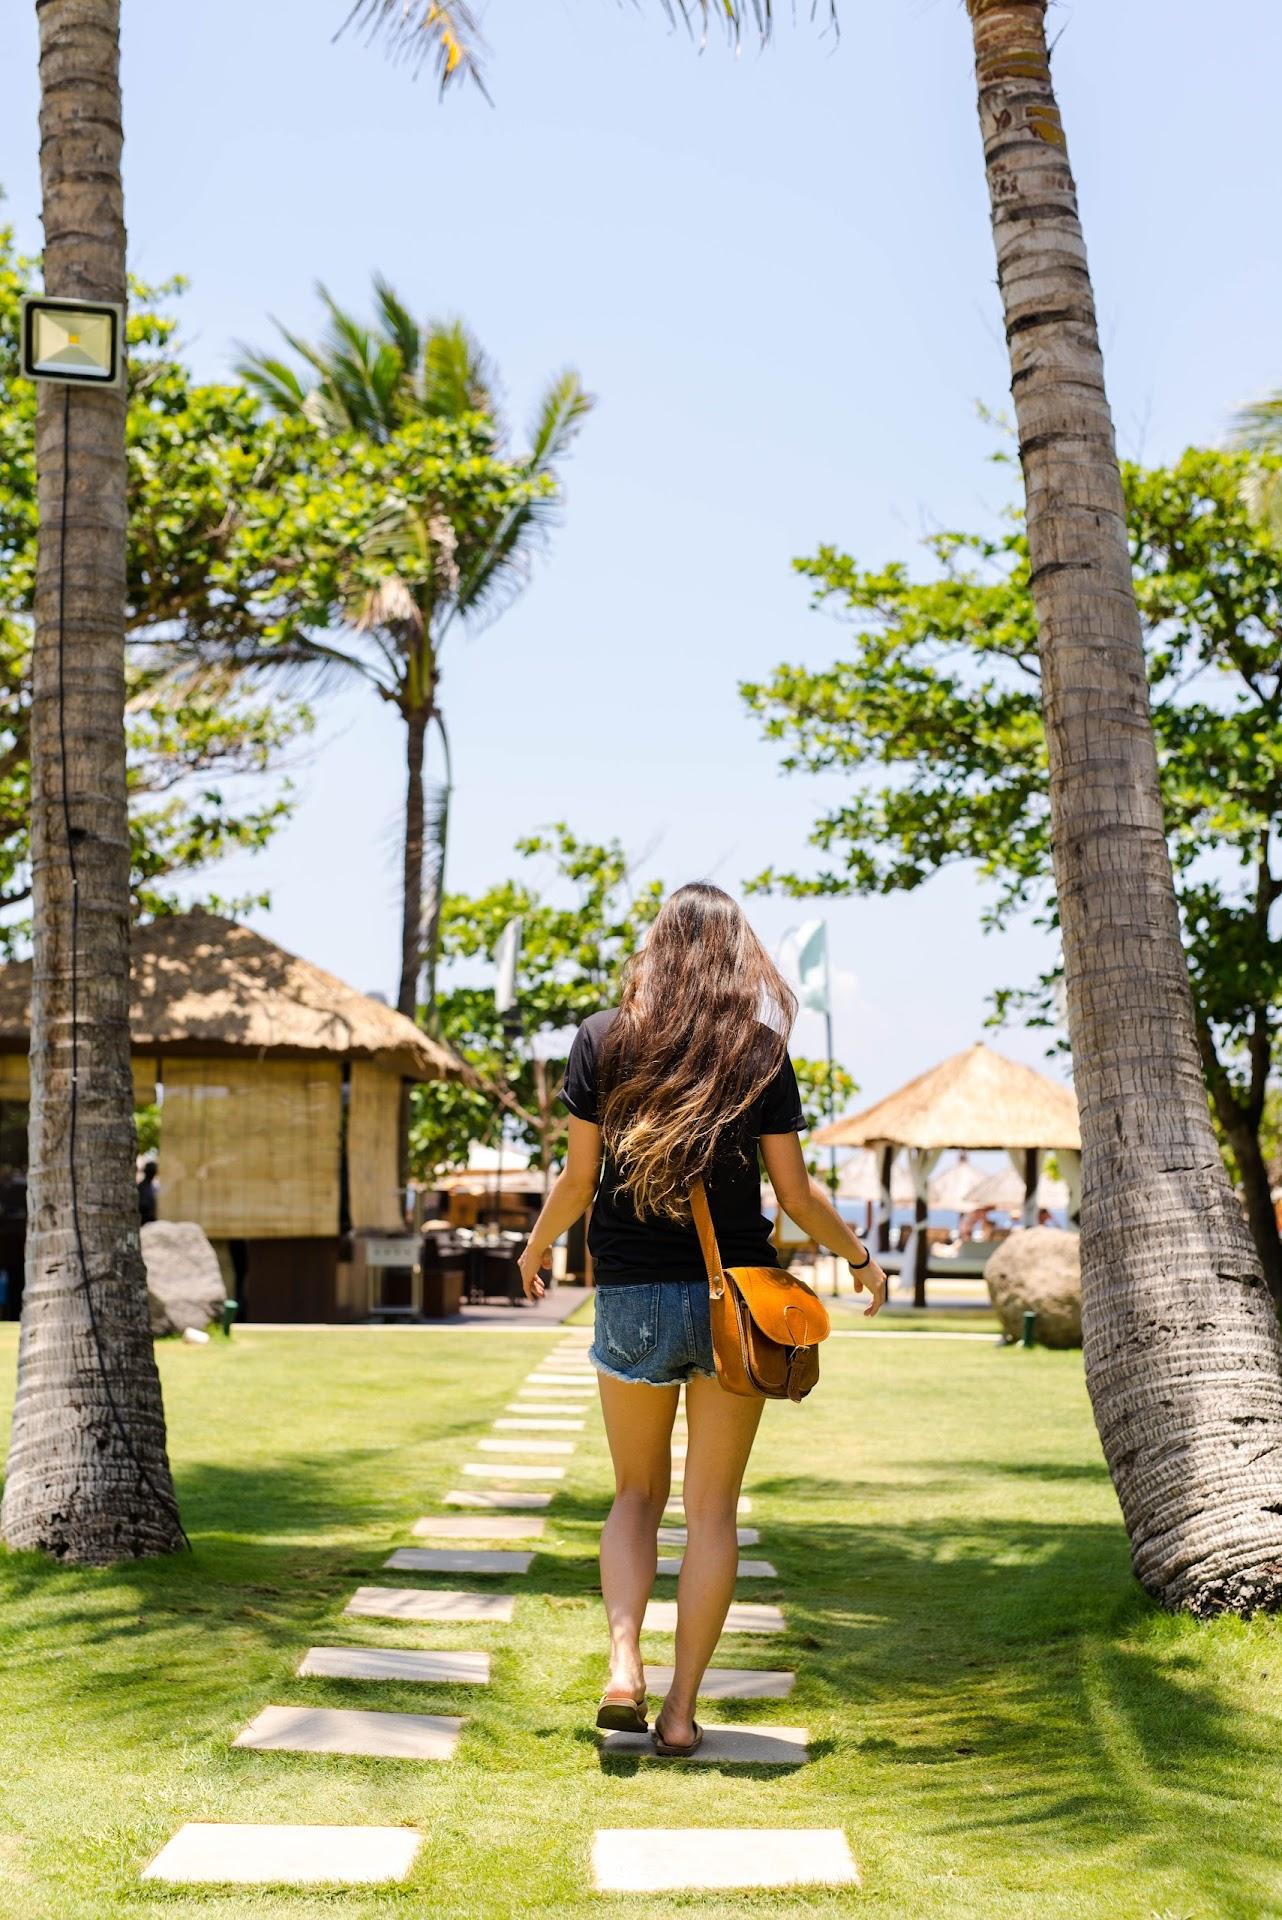 best hotels in bali, honeymoon resort, bali nusa dua, travel blog, couple travel bloggers, asian korean blogger, japanese, california san francisco bay area travel blogger, value hotels in bali, southeast asia, beach outfit, beach style fashion, beach blogger, long asian hair, ombre